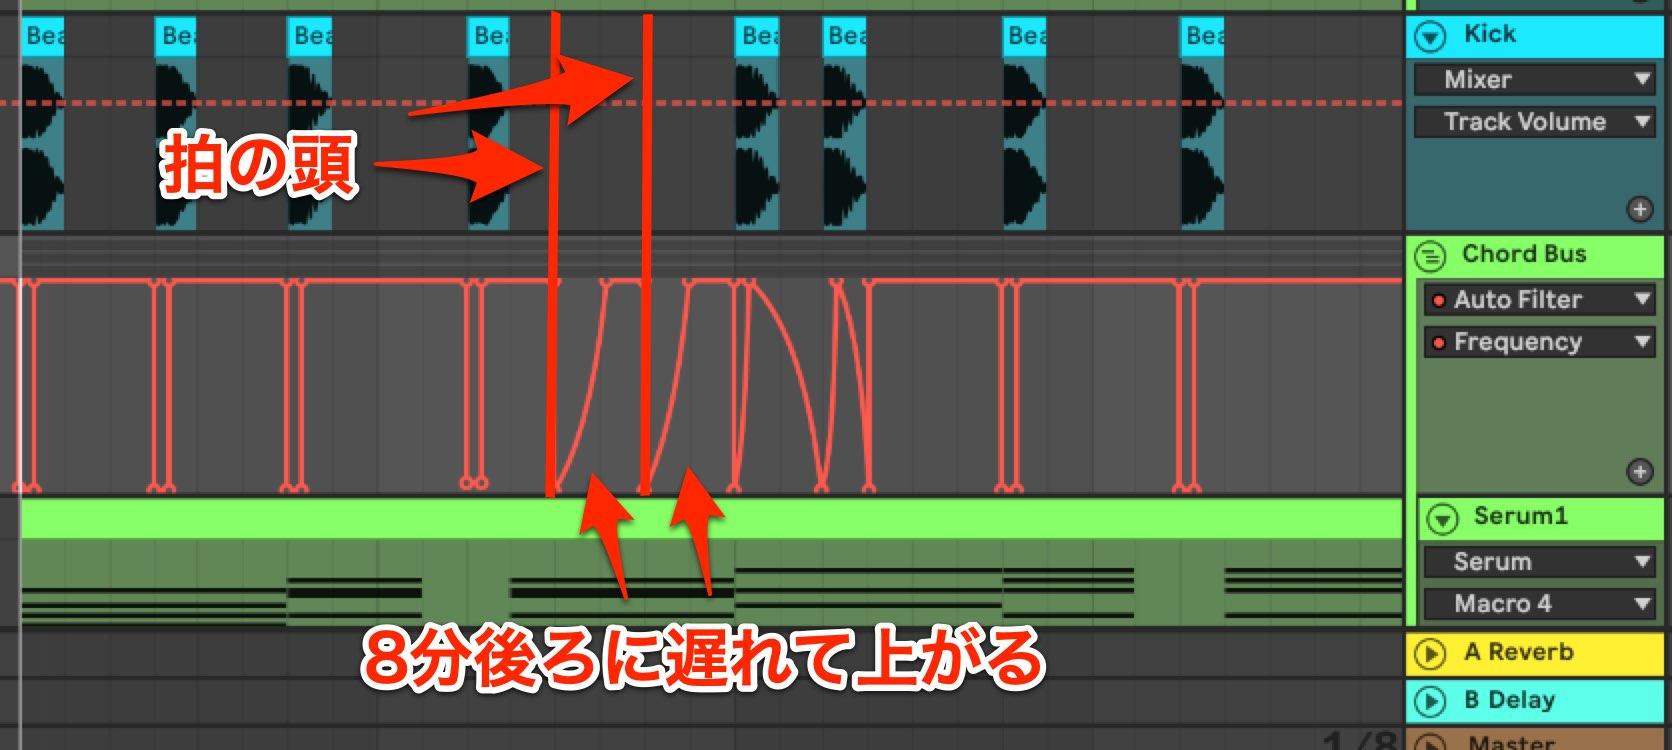 Future Bass コード LPF8